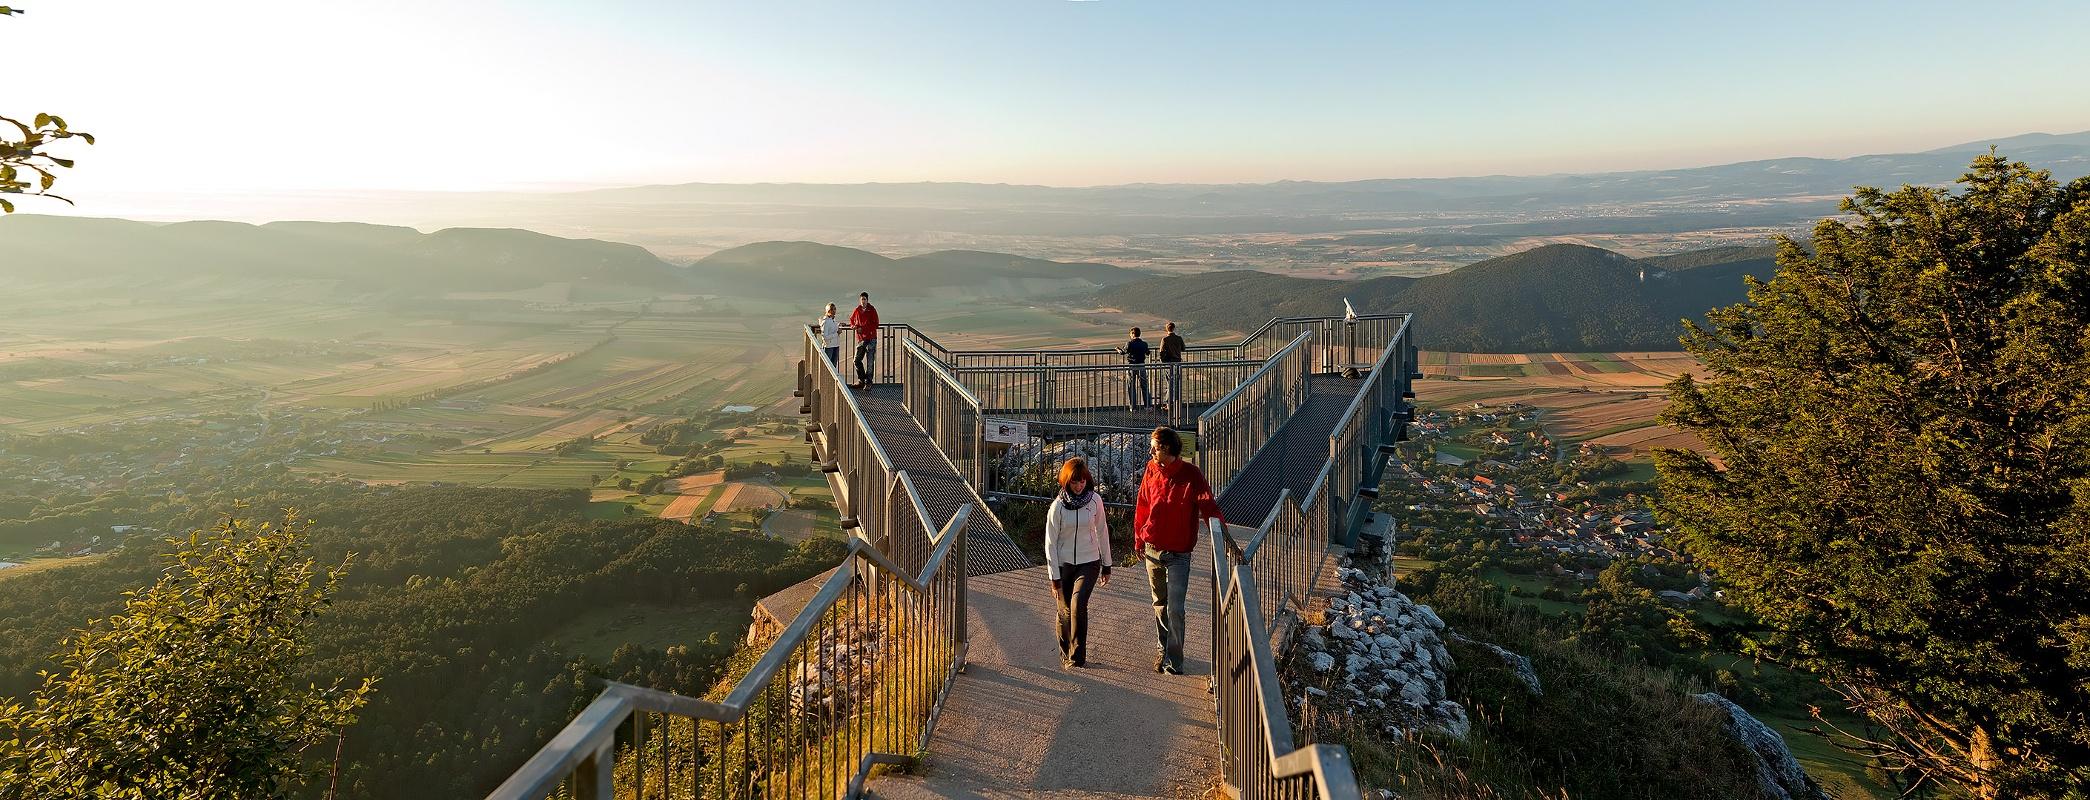 Wab regionale route r markt piesting puchberg for Goldene hohe schneeberg